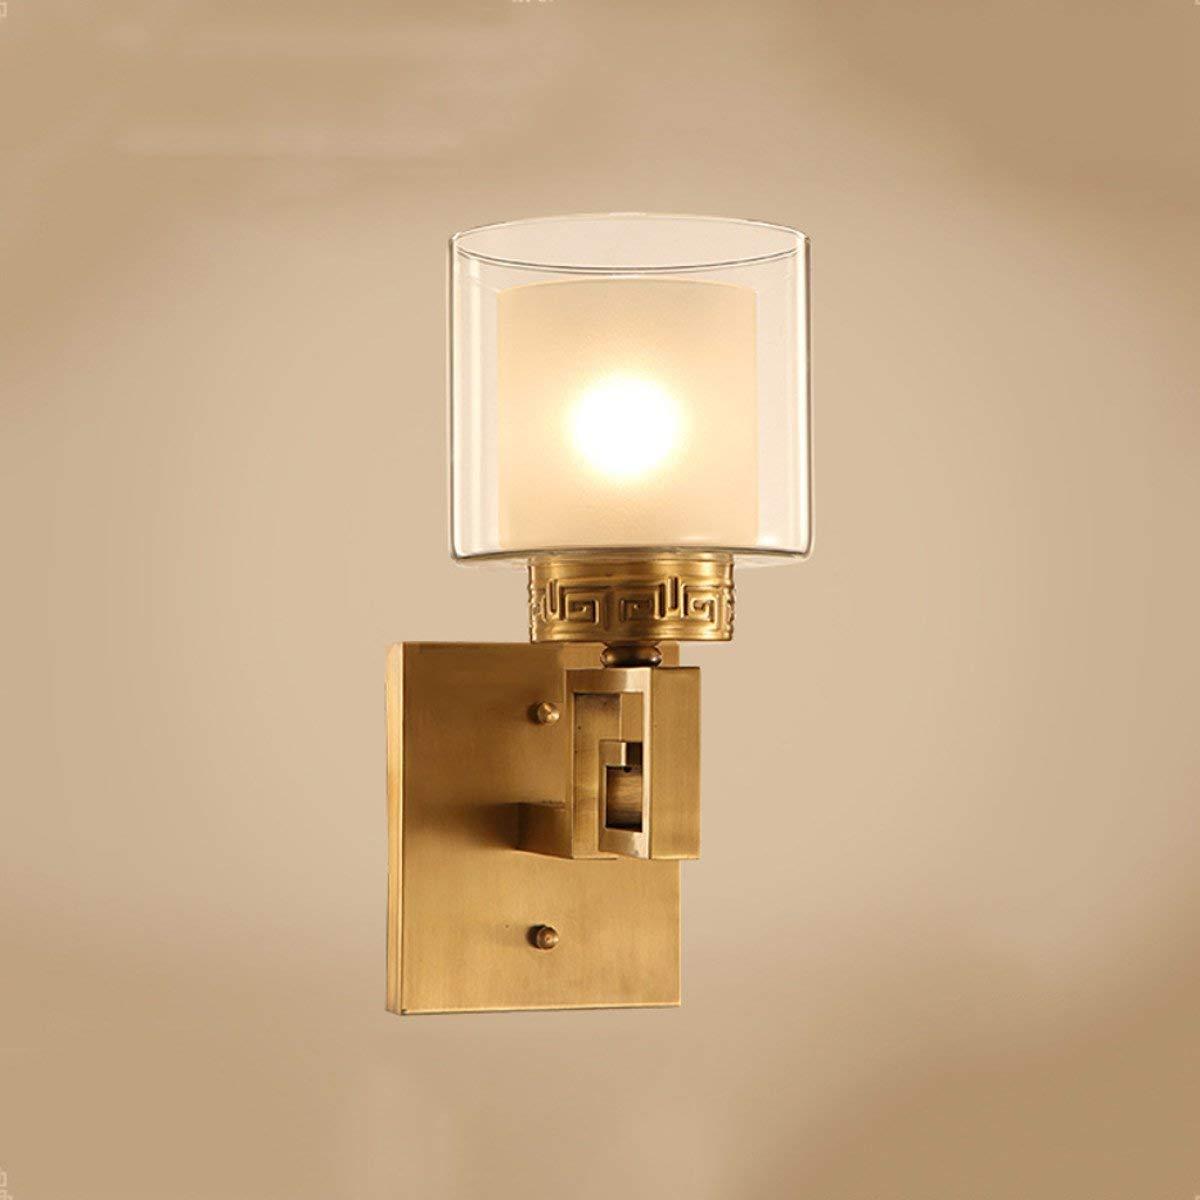 TJTJ 完全な銅の古典的な壁ランプの寝室の壁ランプベッドサイドの壁ランプE27光源 (Color : A) B07R8L94FX A